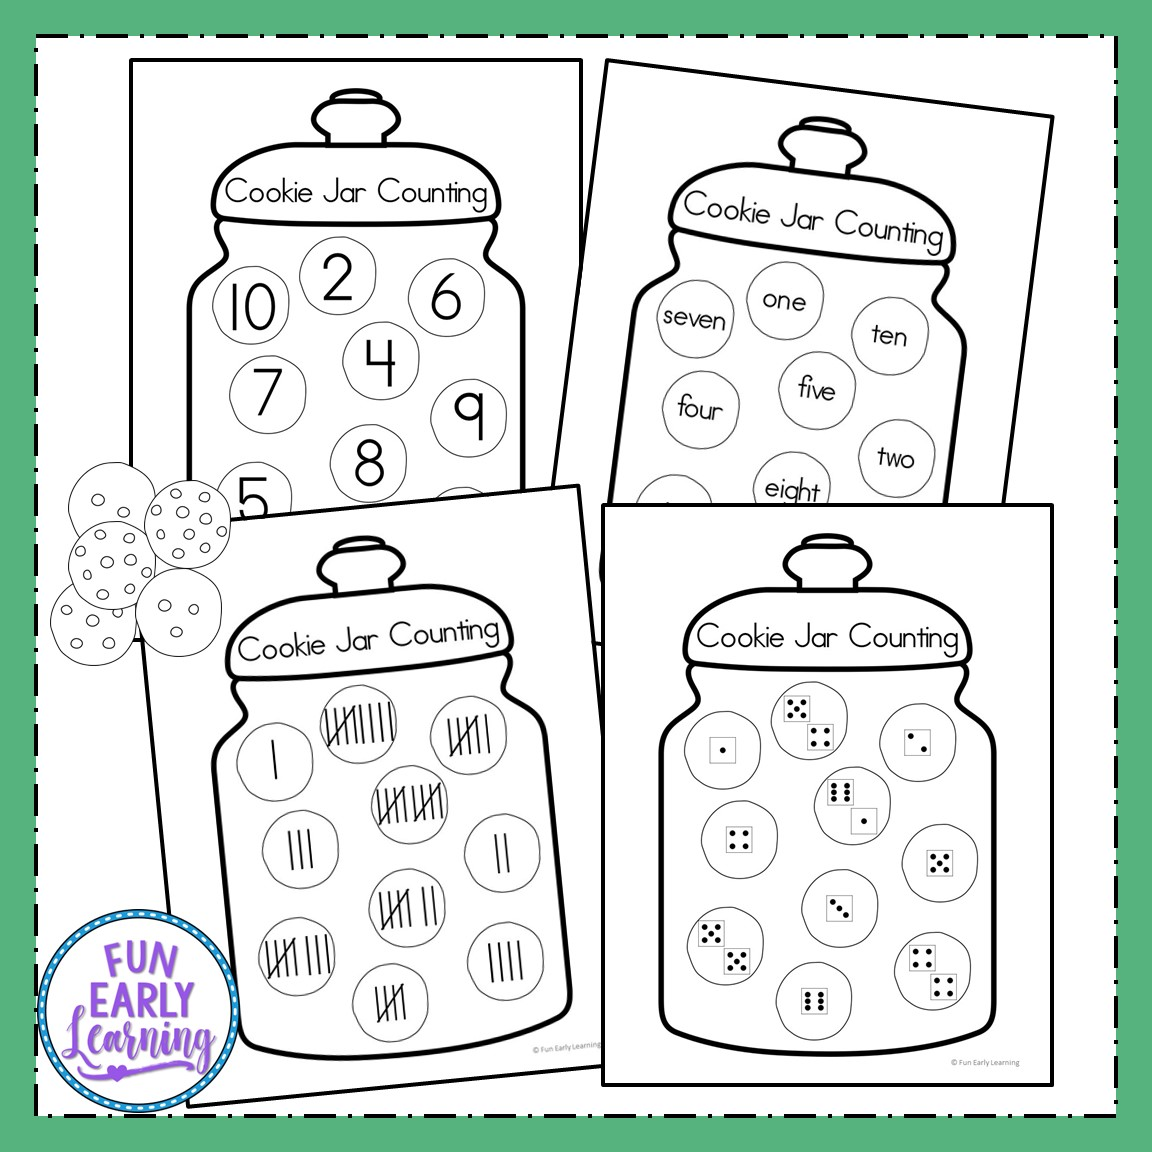 hight resolution of Fun Cookie Jar Counting Activity for Preschool and Kindergarten